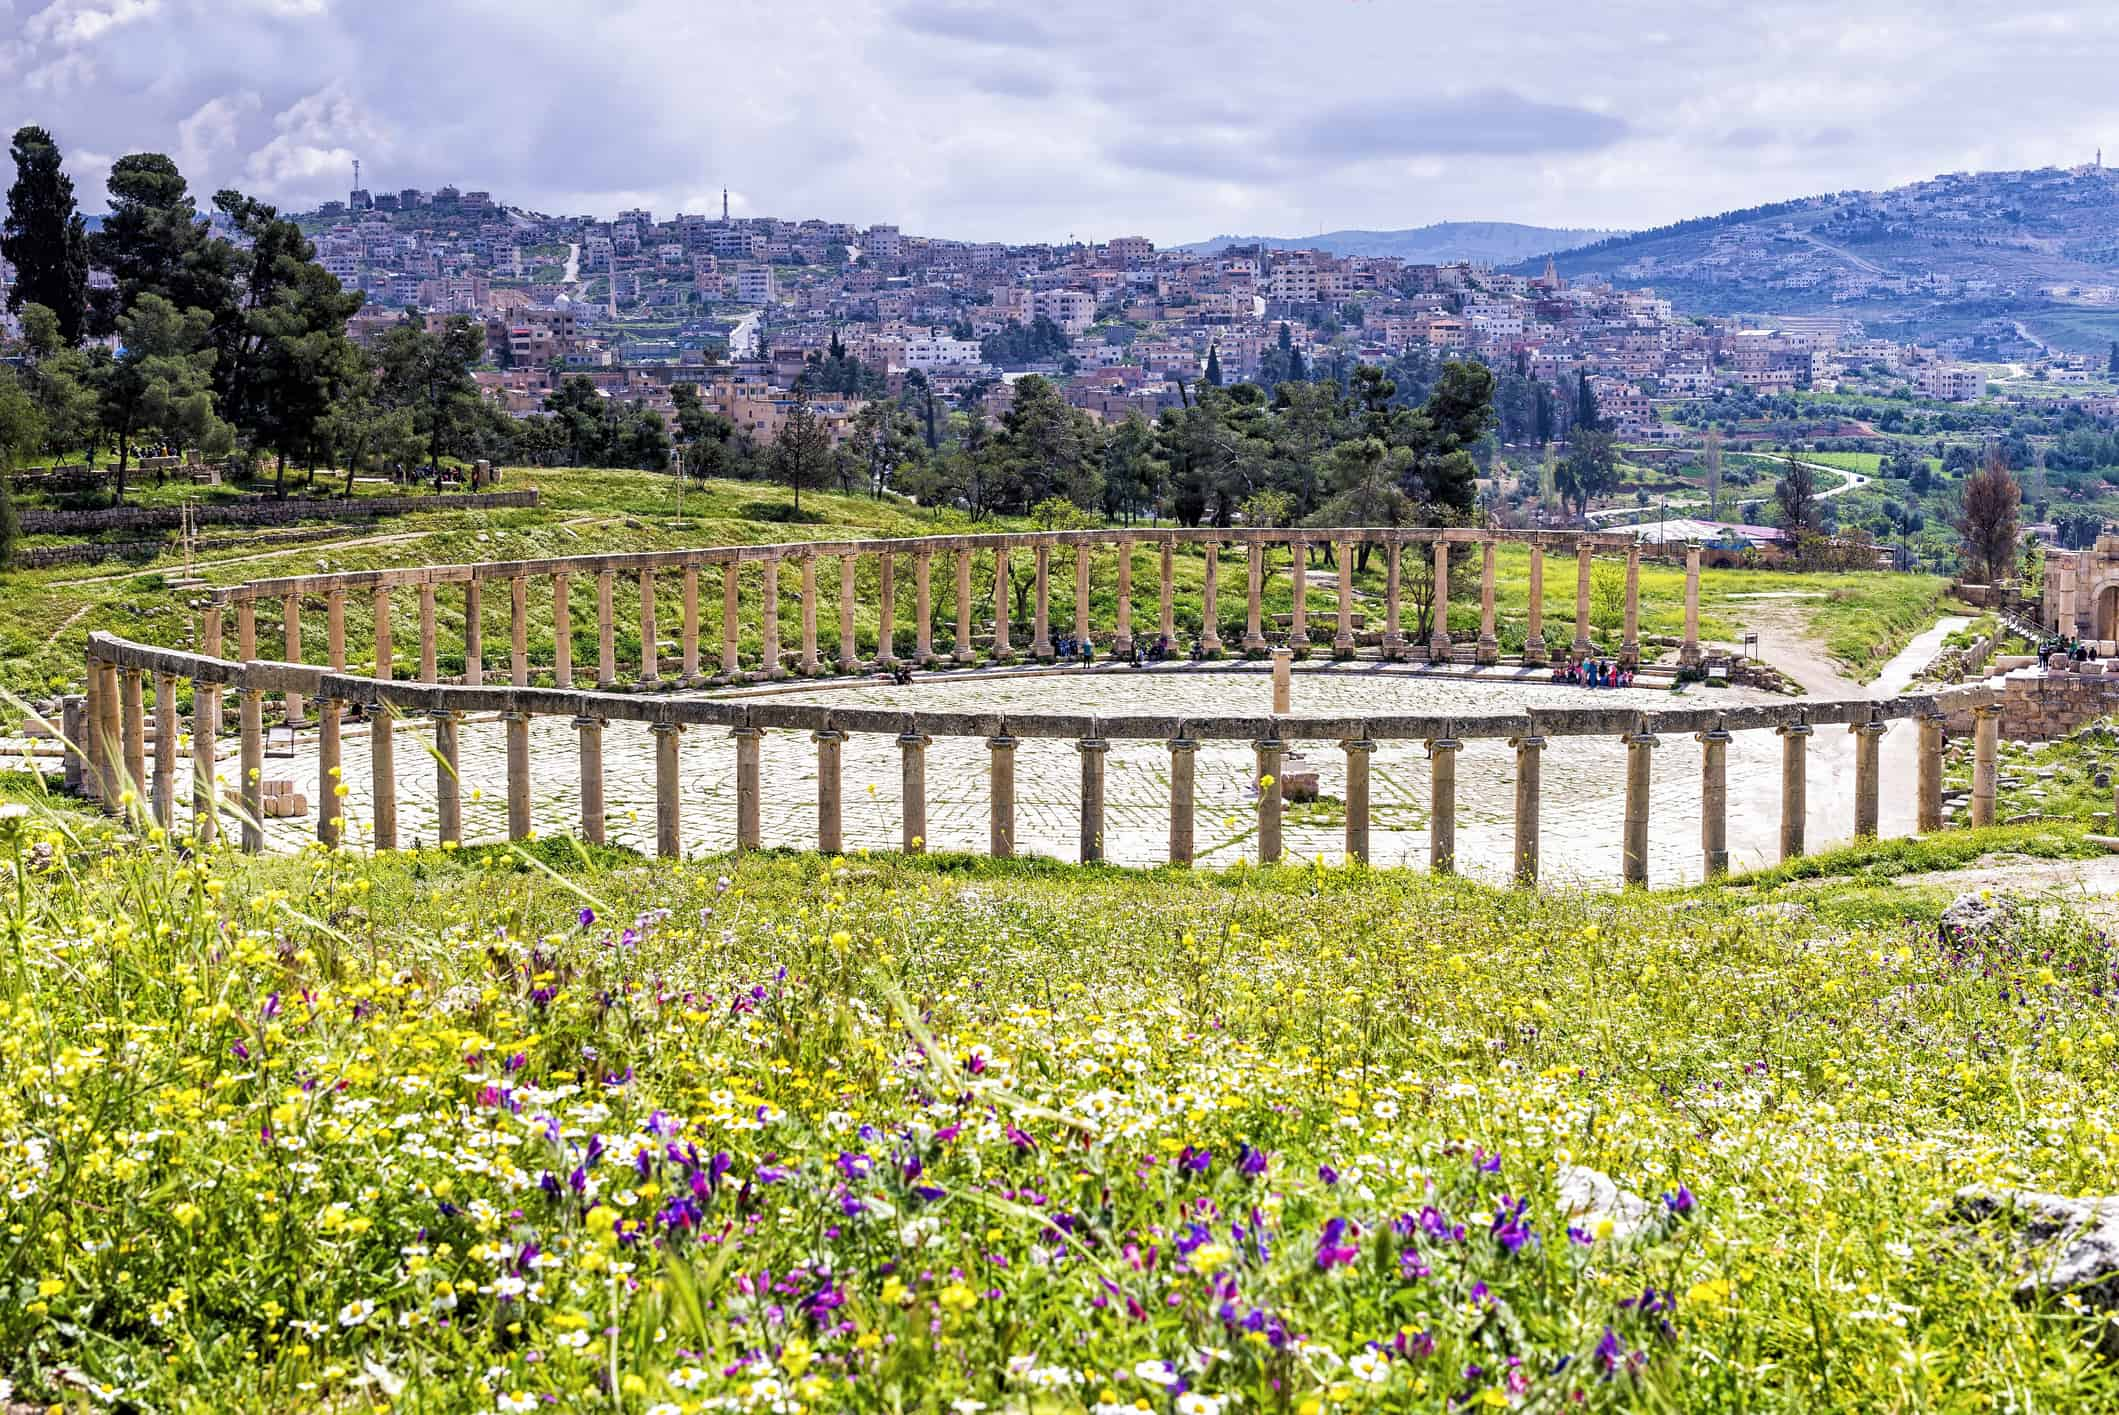 The Oval Forum colonnade in ancient Jerash, Jordan